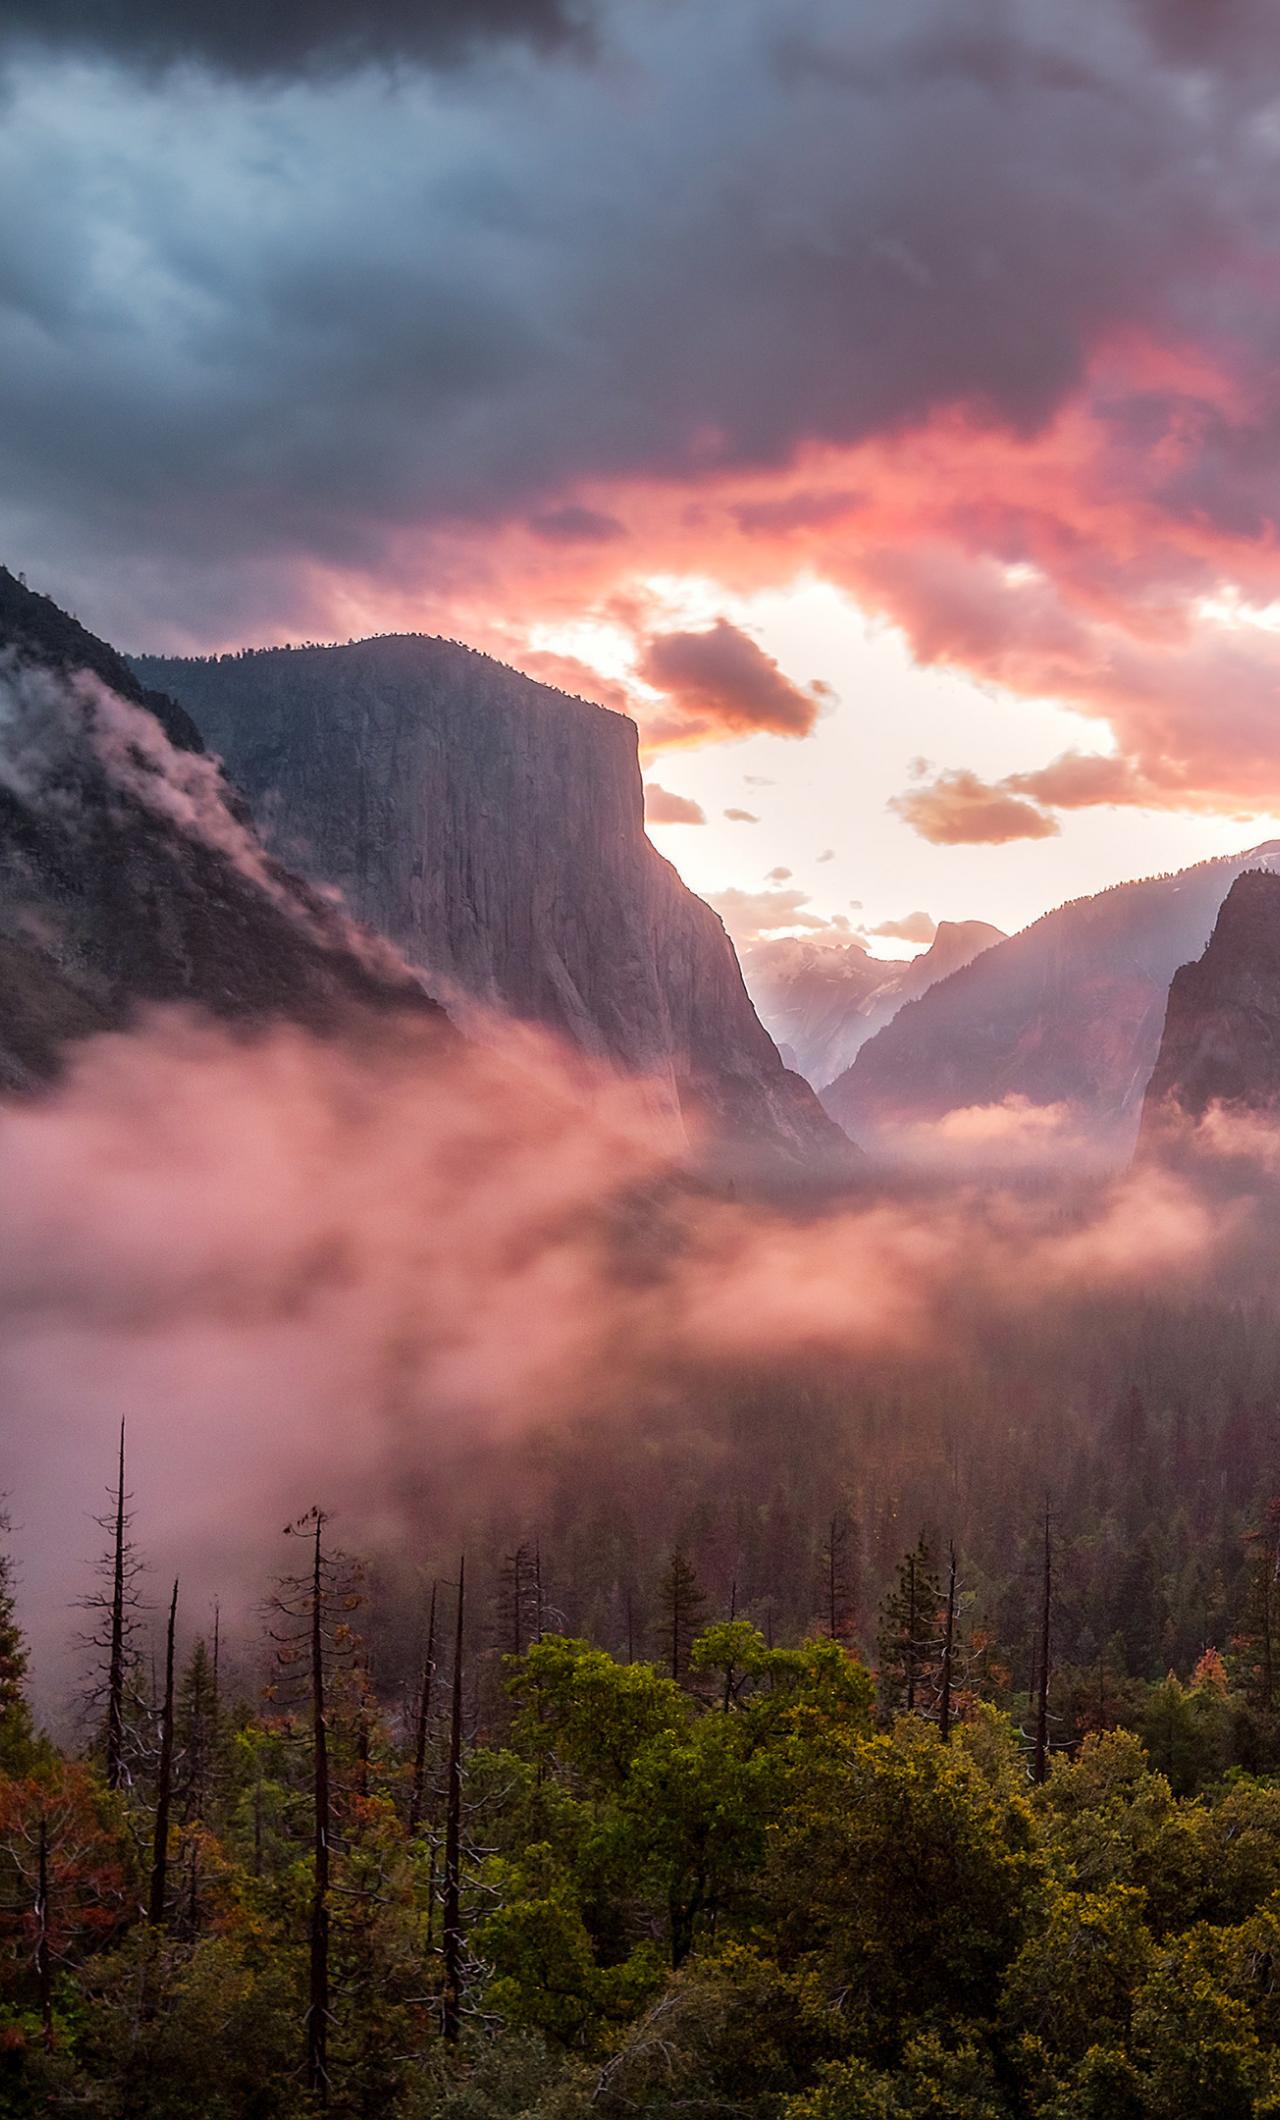 Download 1280x2120 Wallpaper Misty Yosemite Valley National